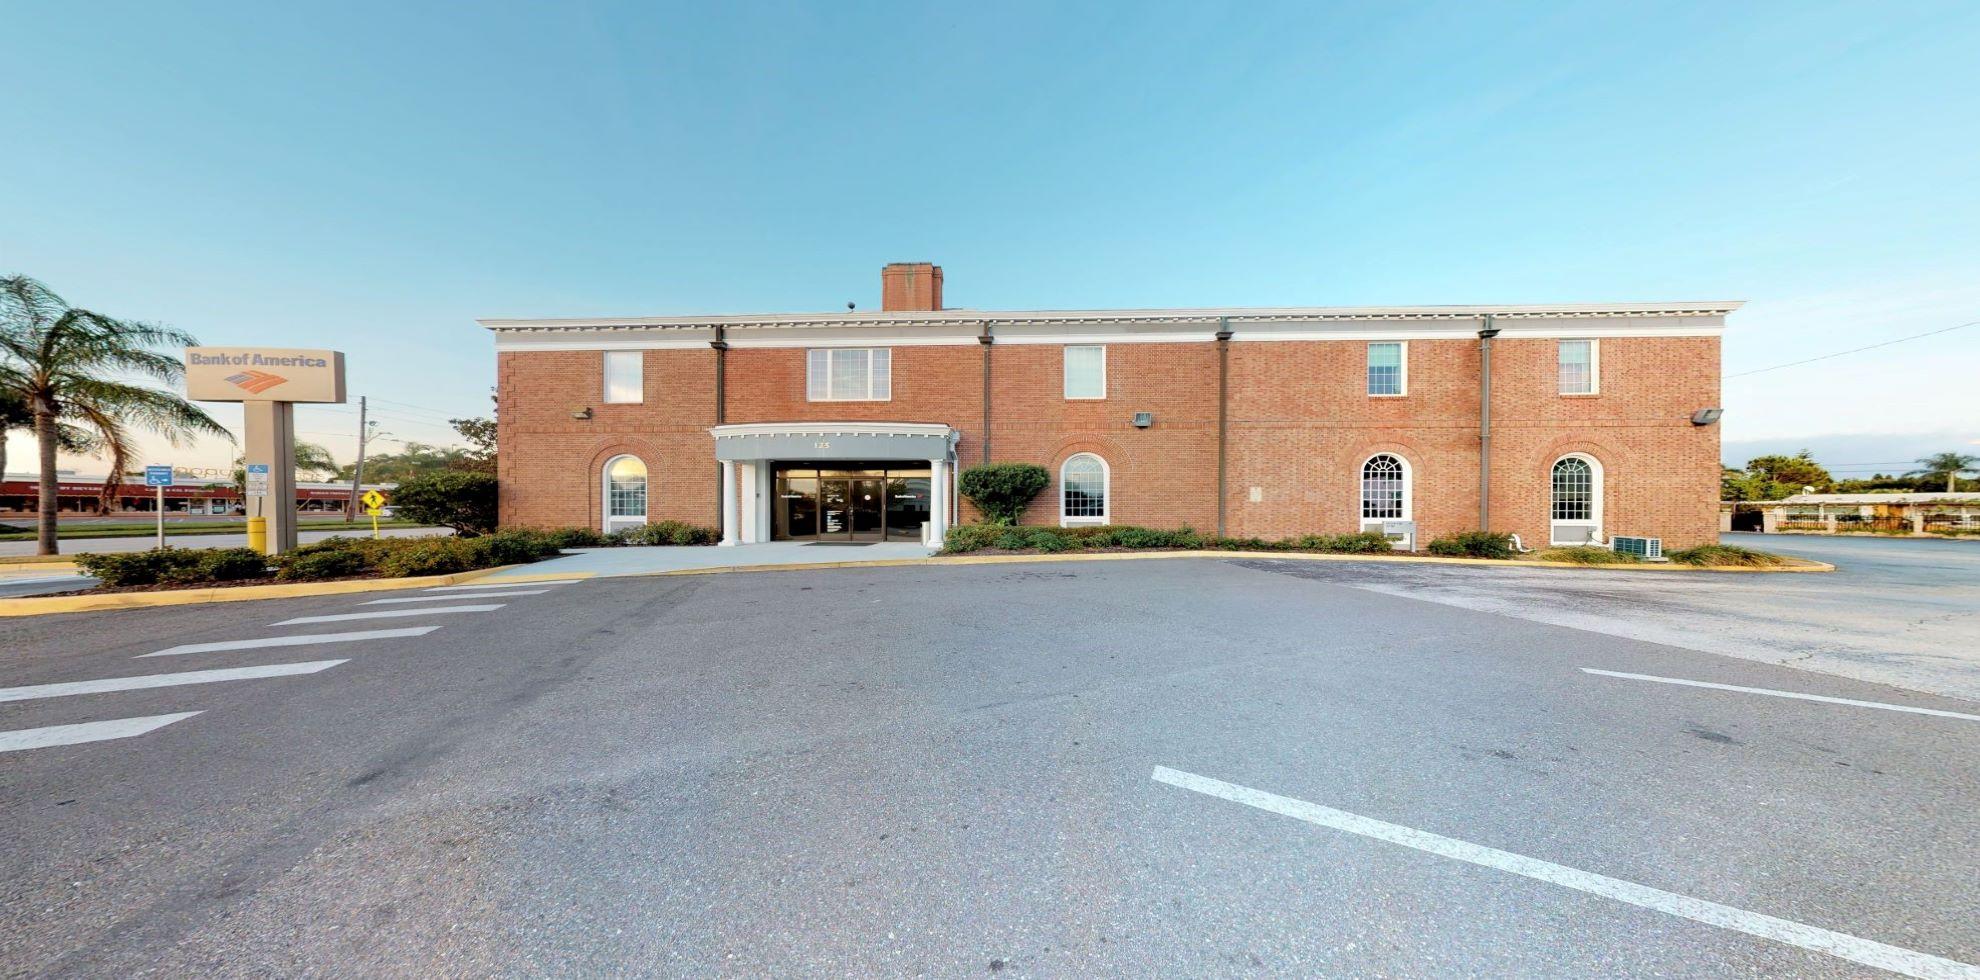 Bank of America financial center with drive-thru ATM   125 Indian Rocks Rd N, Belleair Bluffs, FL 33770